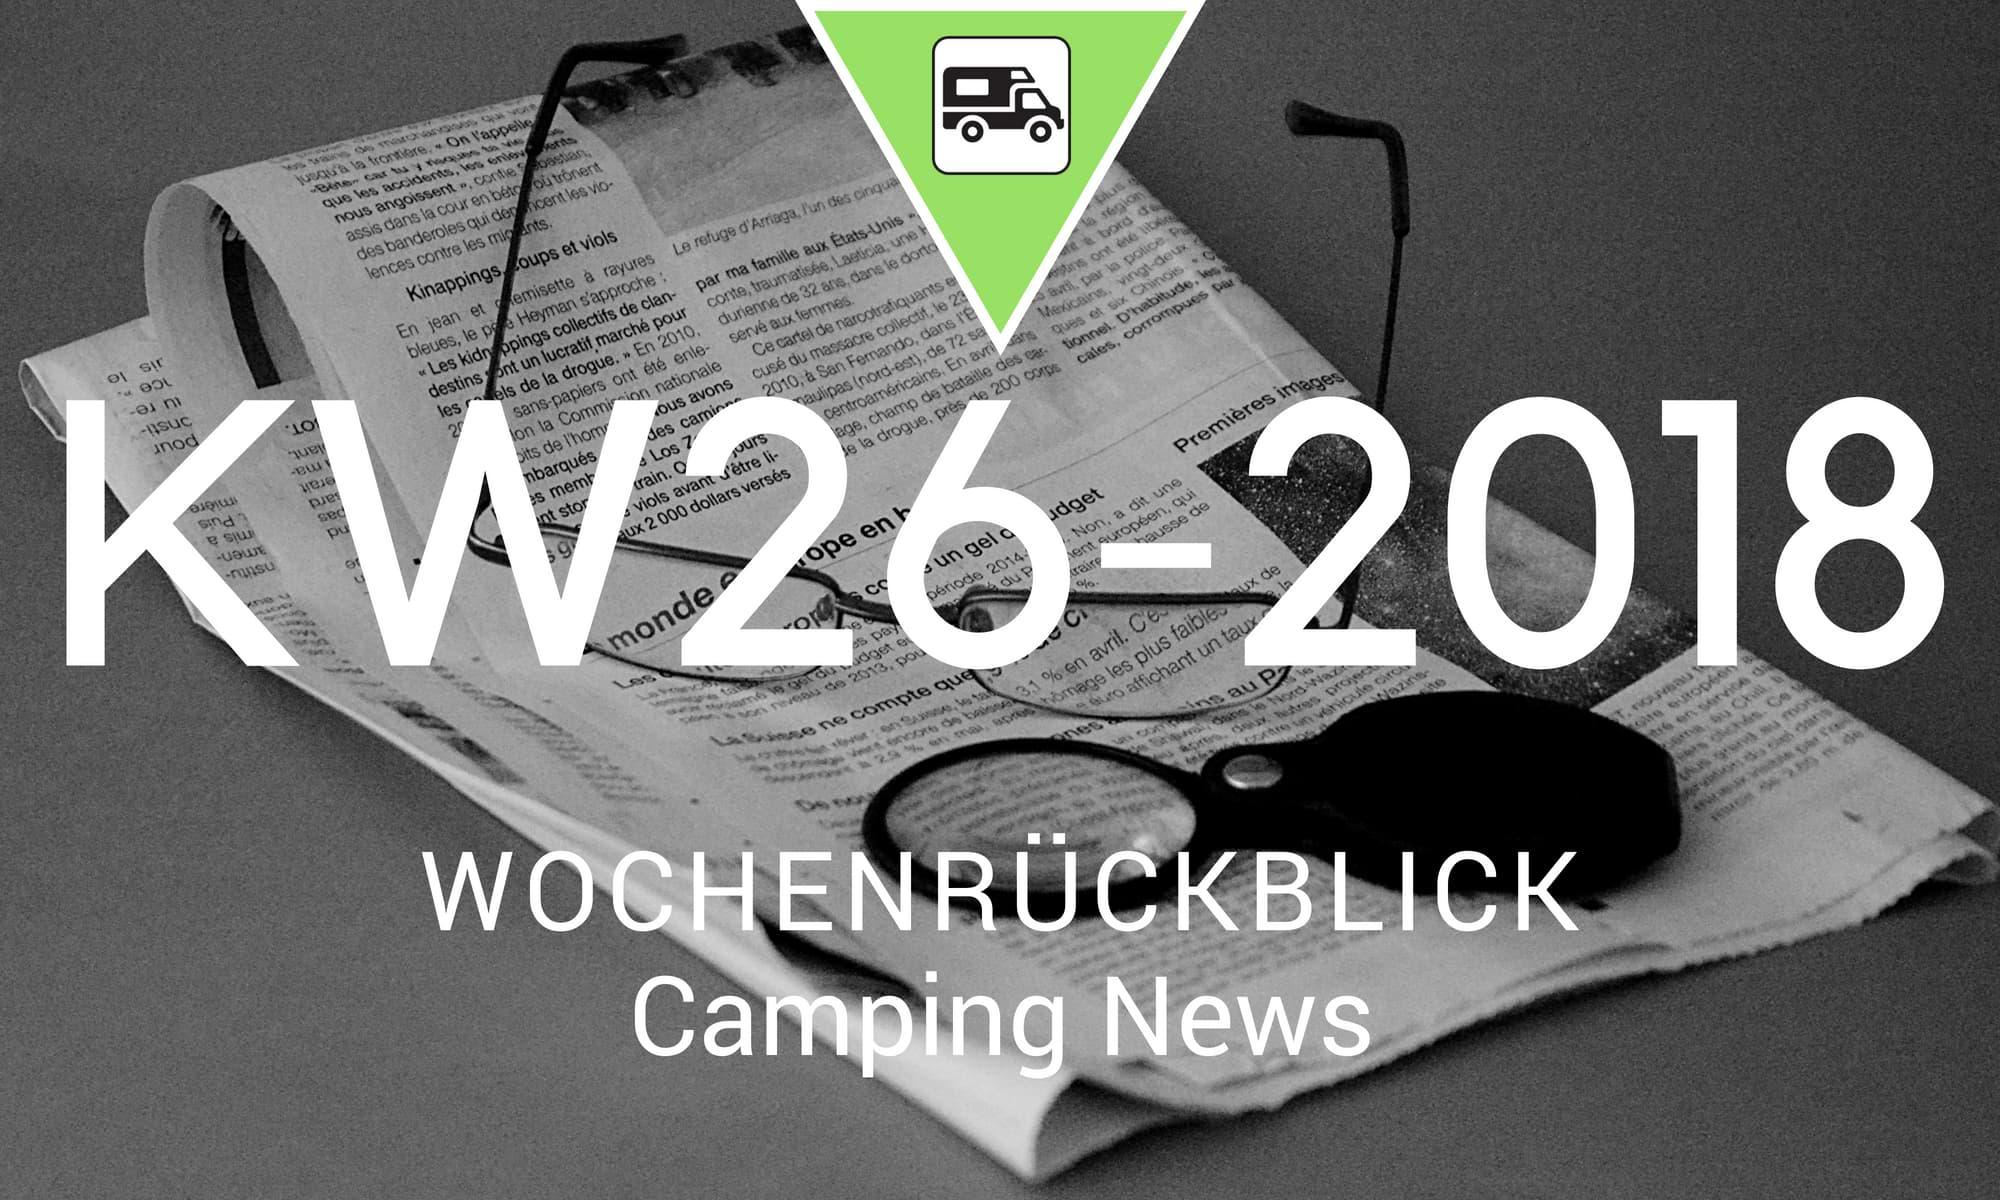 Wochenrückblick Camping News KW26-2018